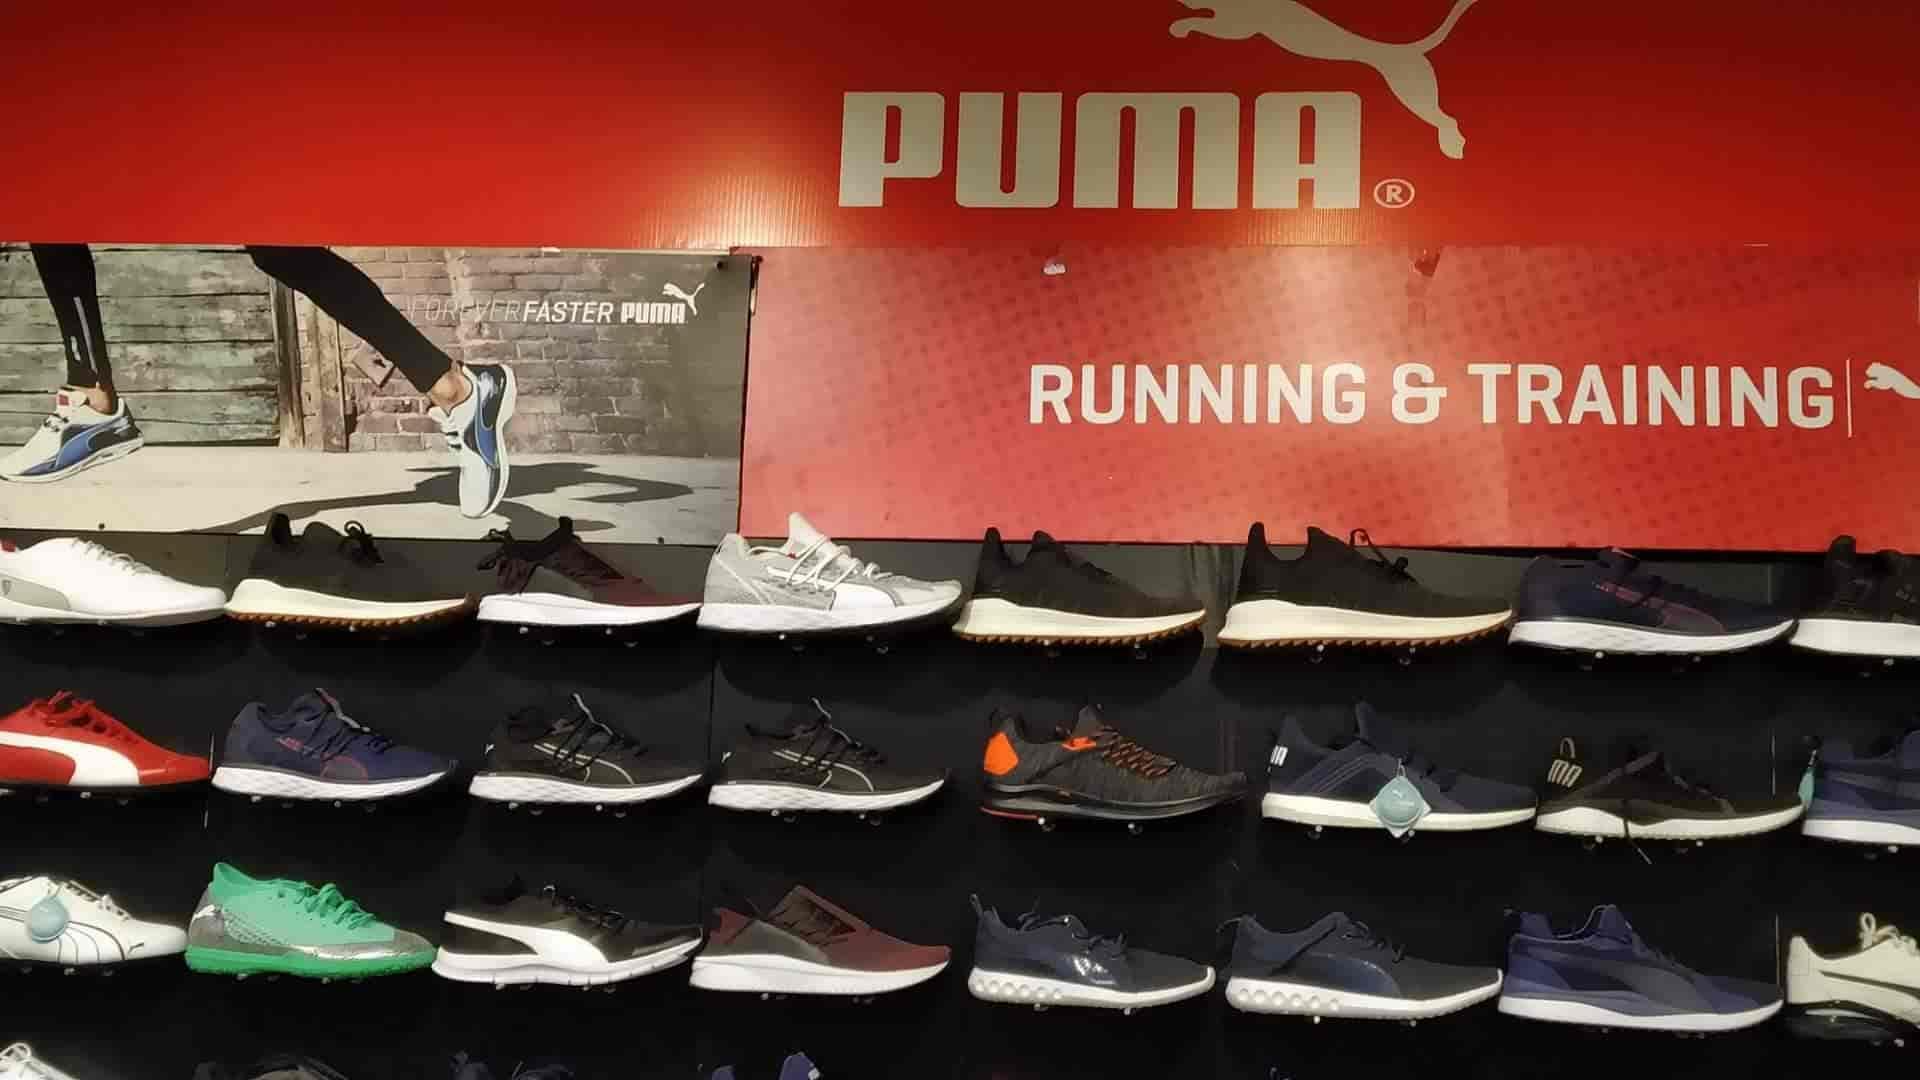 Puma Factory Outlet, Haldwani Road